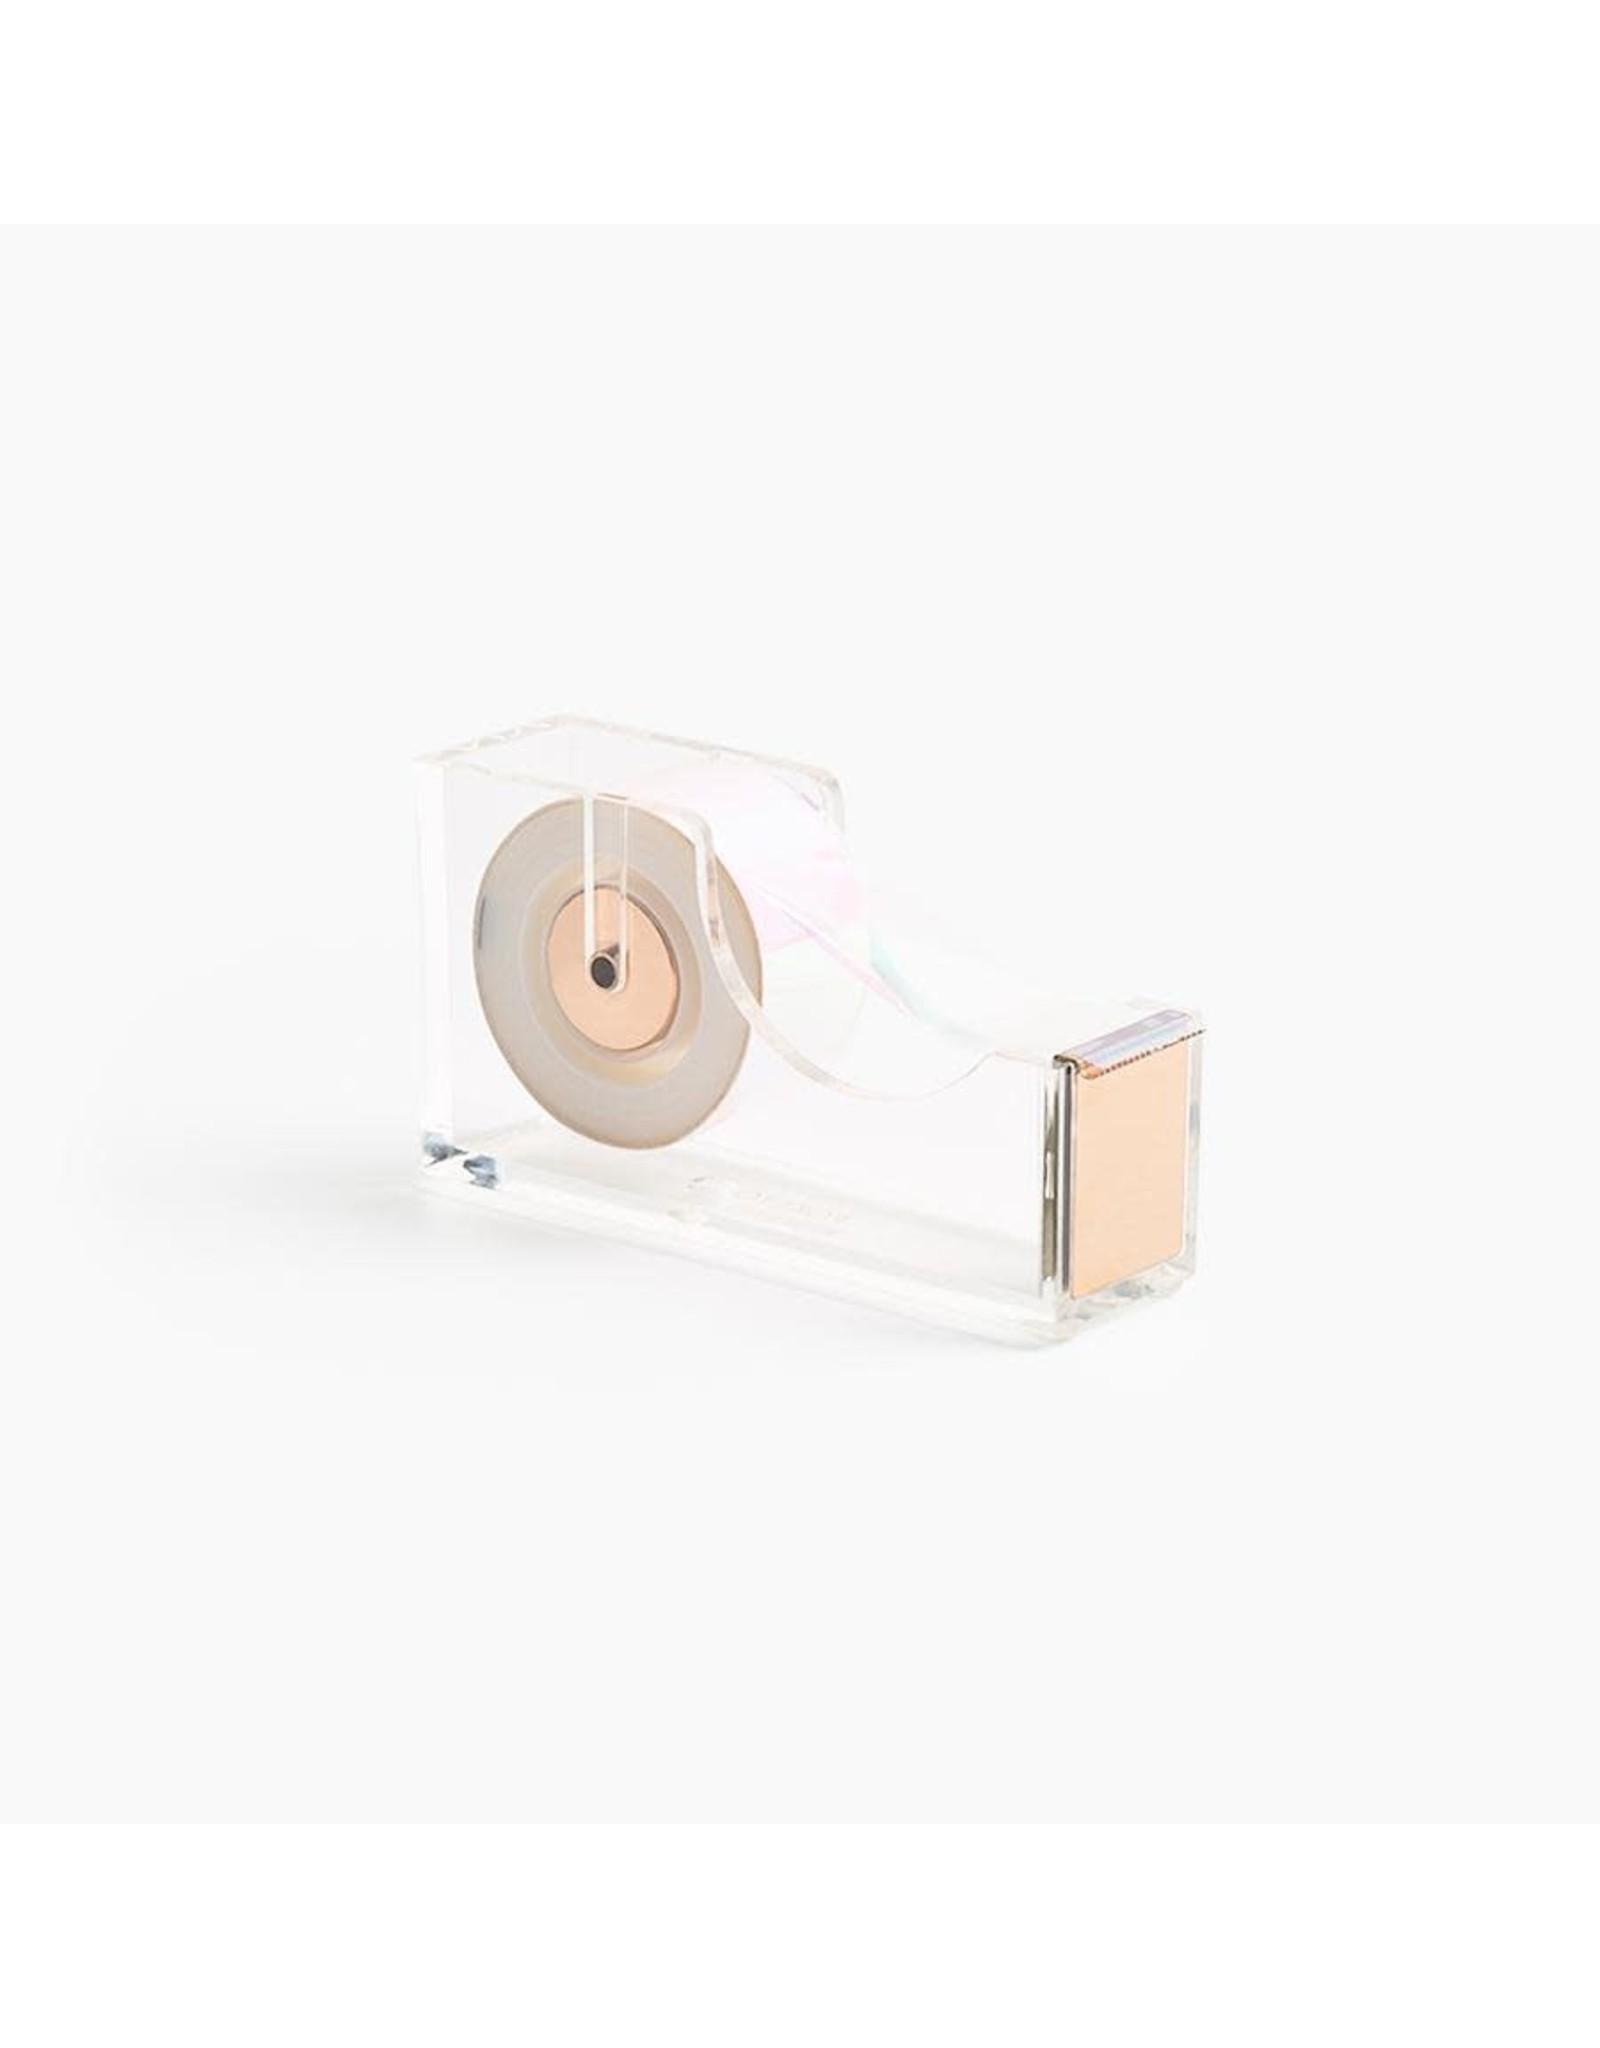 Poketo Lucite Tape Dispenser Gold